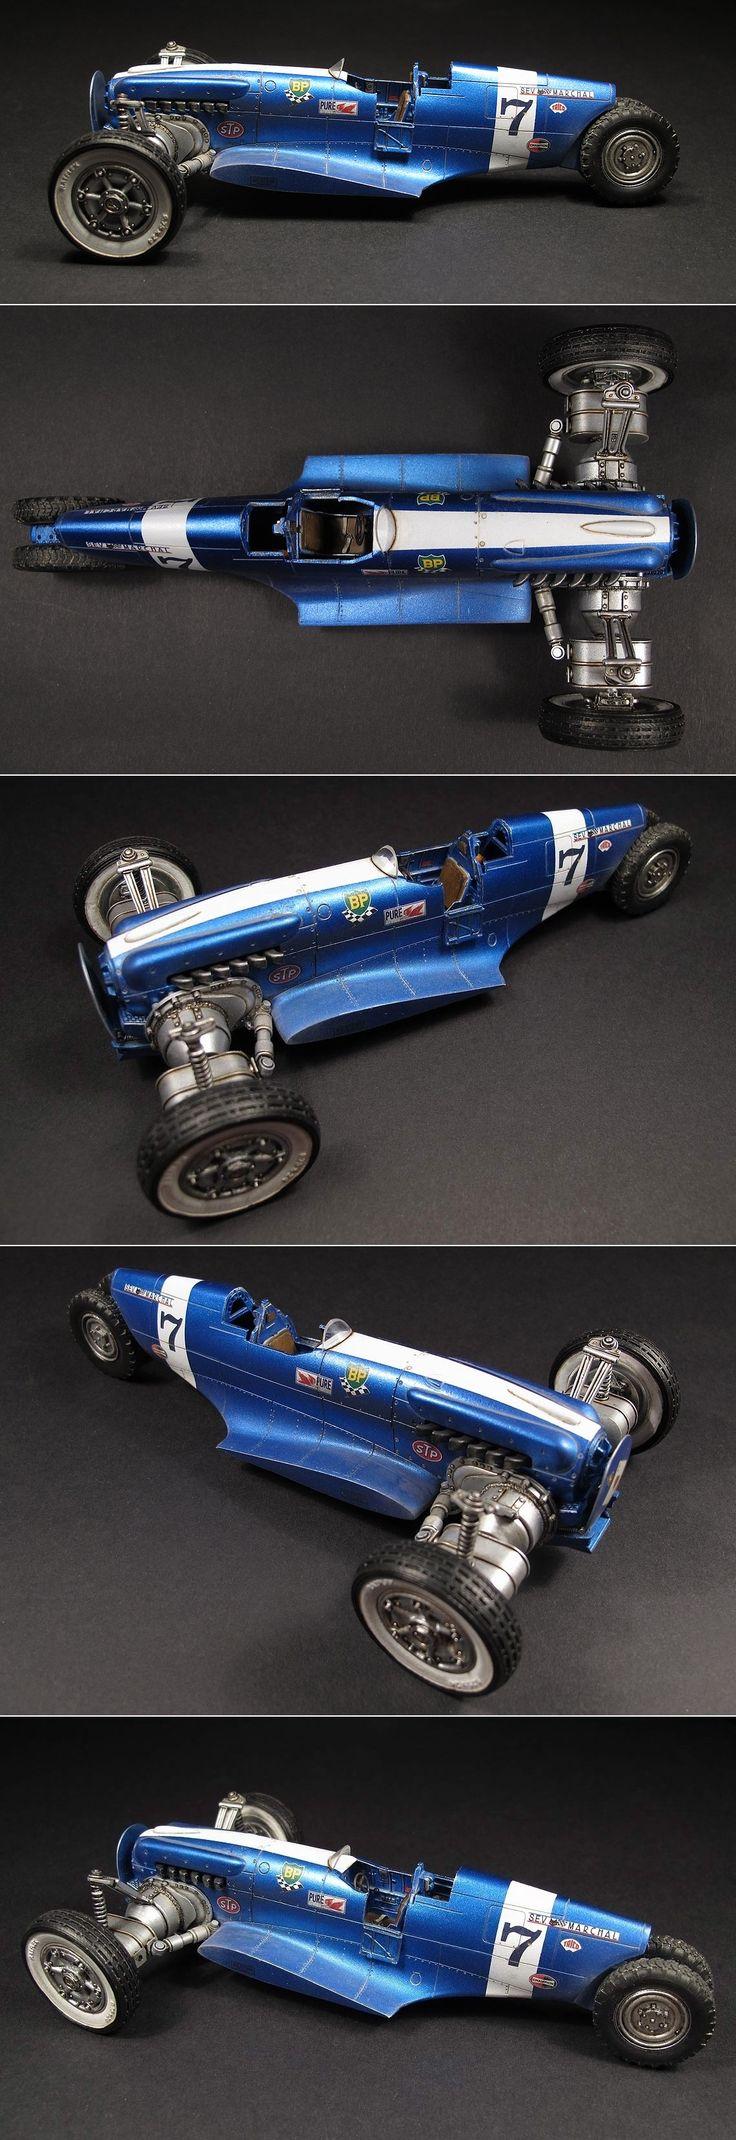 Junk Tank Rock Racer - Viper racing car - Kitbashing a Viper http://www.marceldulong.com/plastics/junk-tank-rock-racer